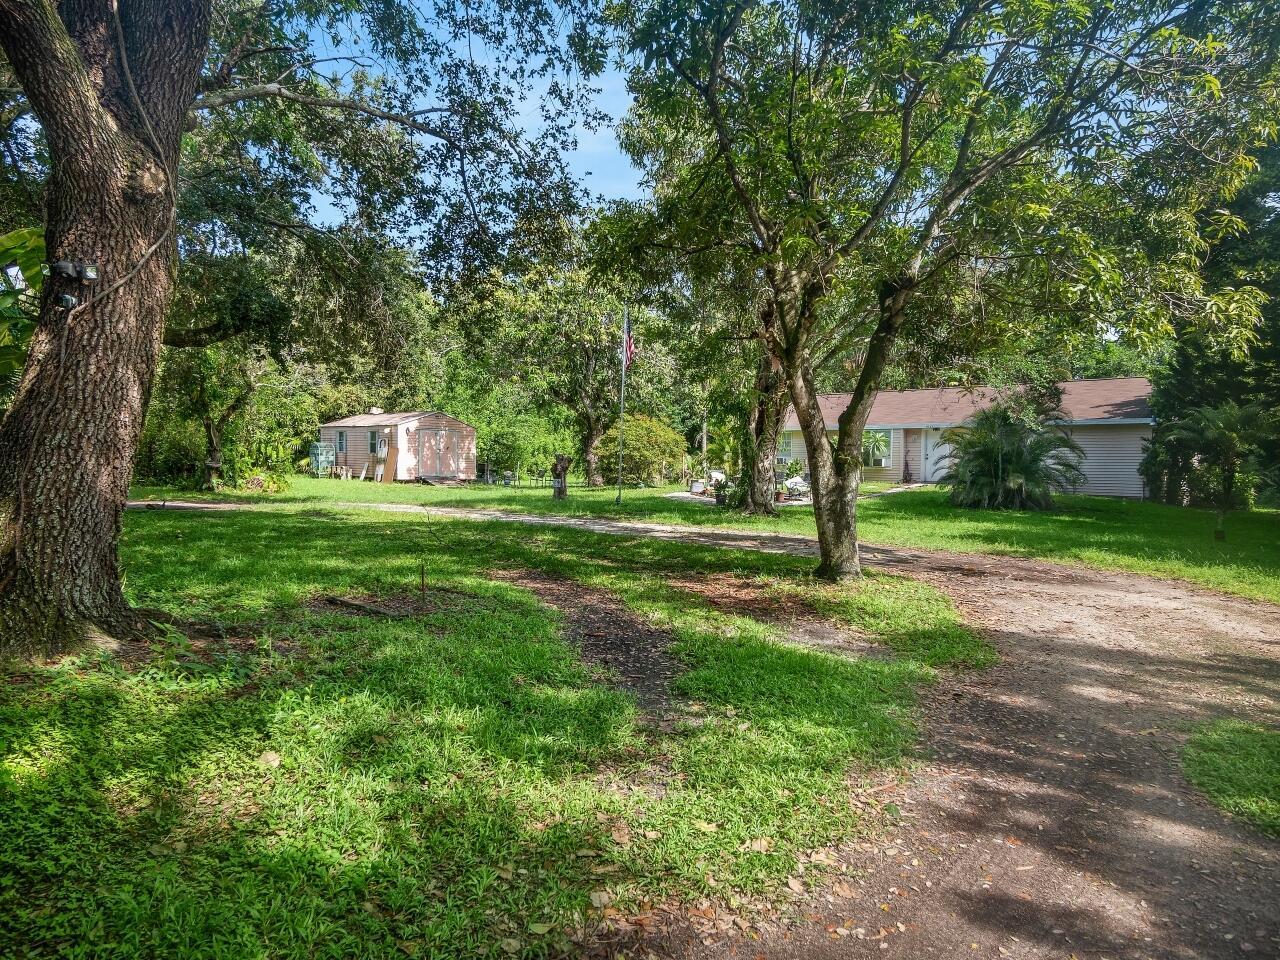 Home for sale in S/D OF 12-45-42, SE 1/4 IN Boynton Beach Florida